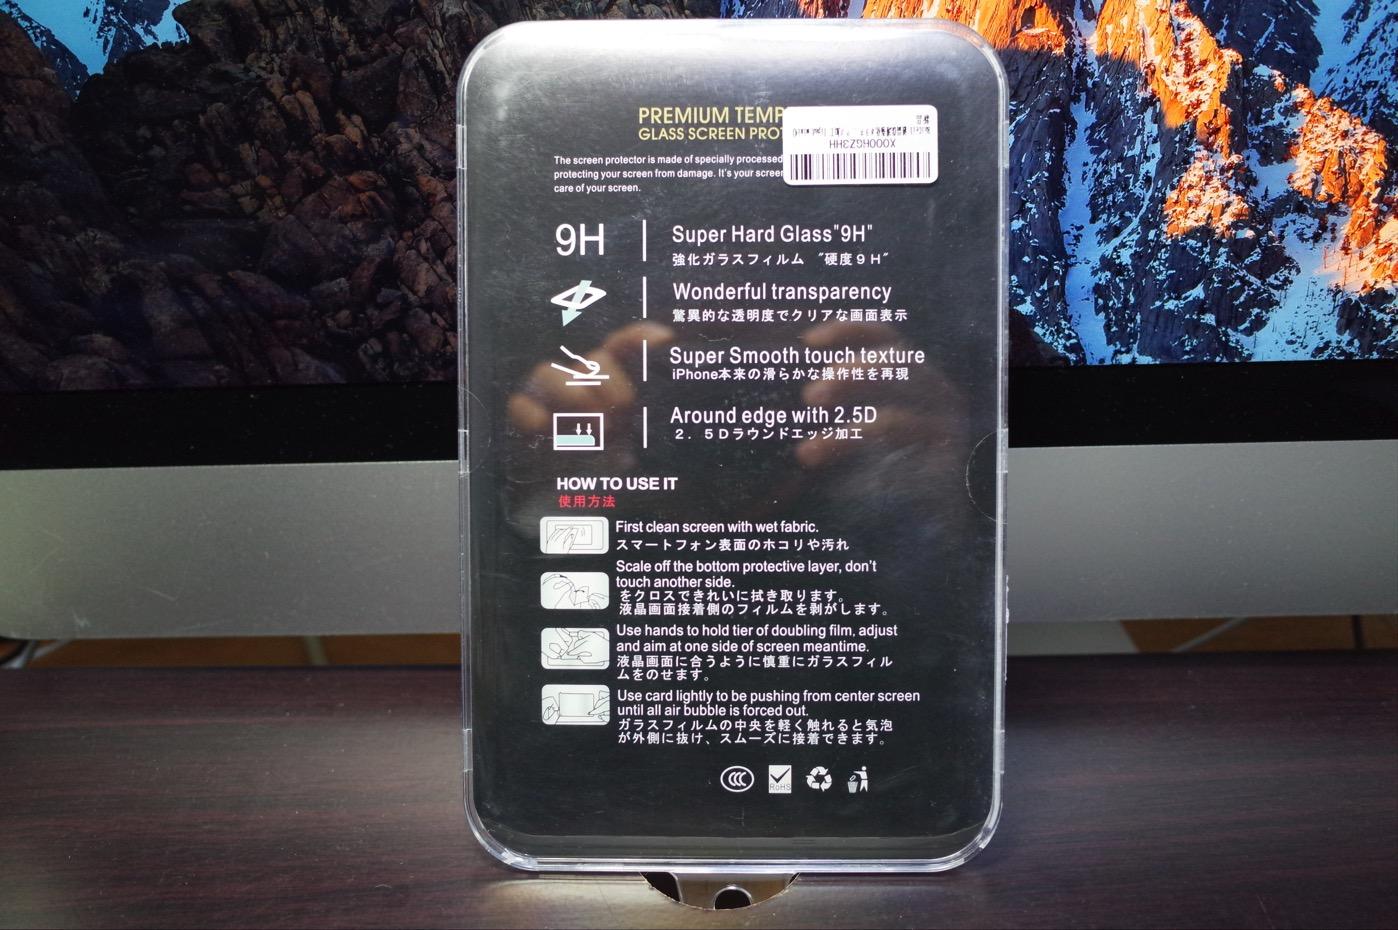 RoiCeil 液晶保護強化ガラスフィルム 硬度9H 超薄0.3mm 2.5D ラウンドエッジ加工-3